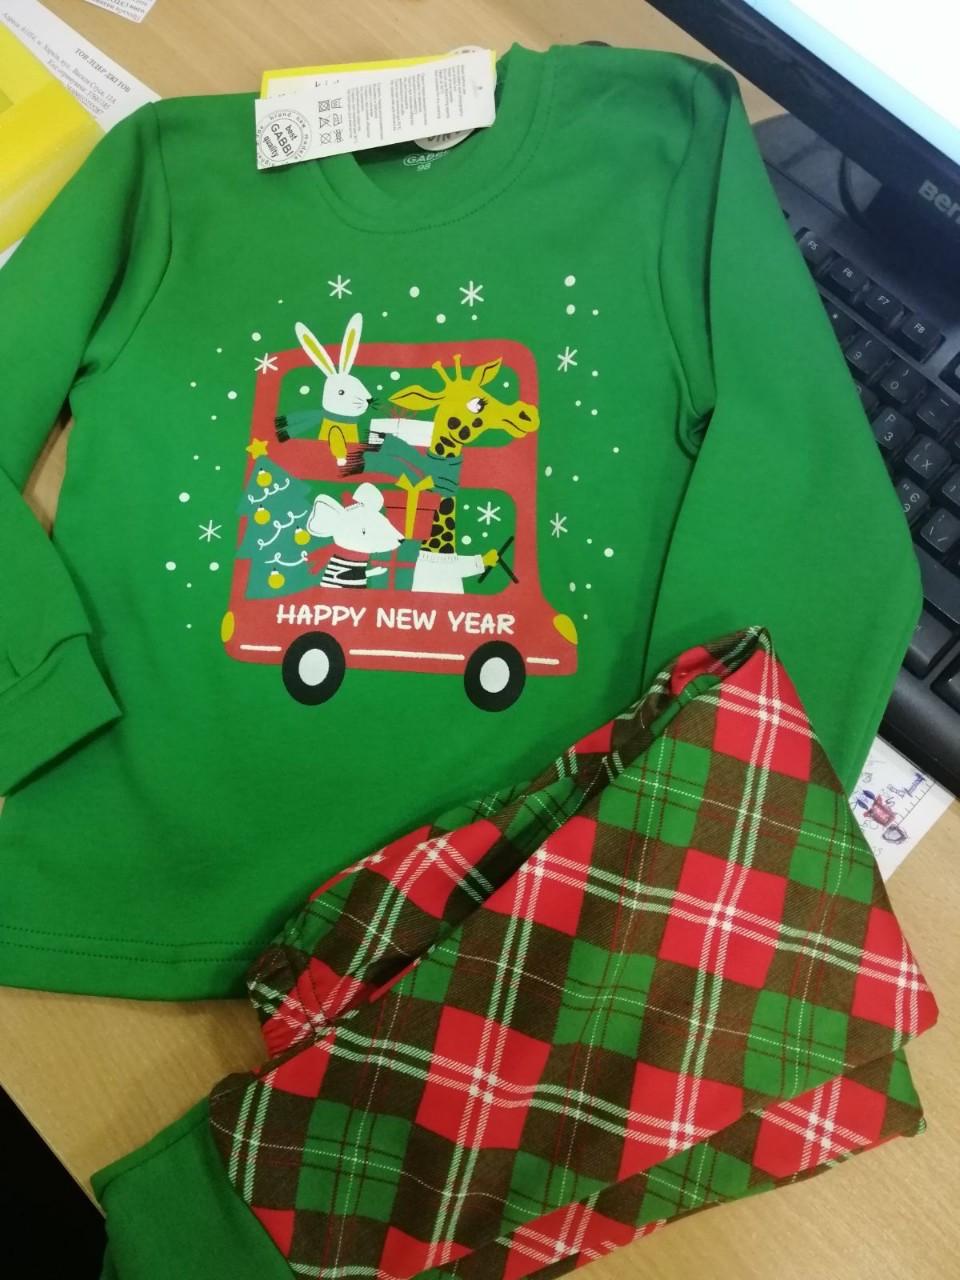 Пижама для детей Новый год 2021 «Happy New Year» зелёная